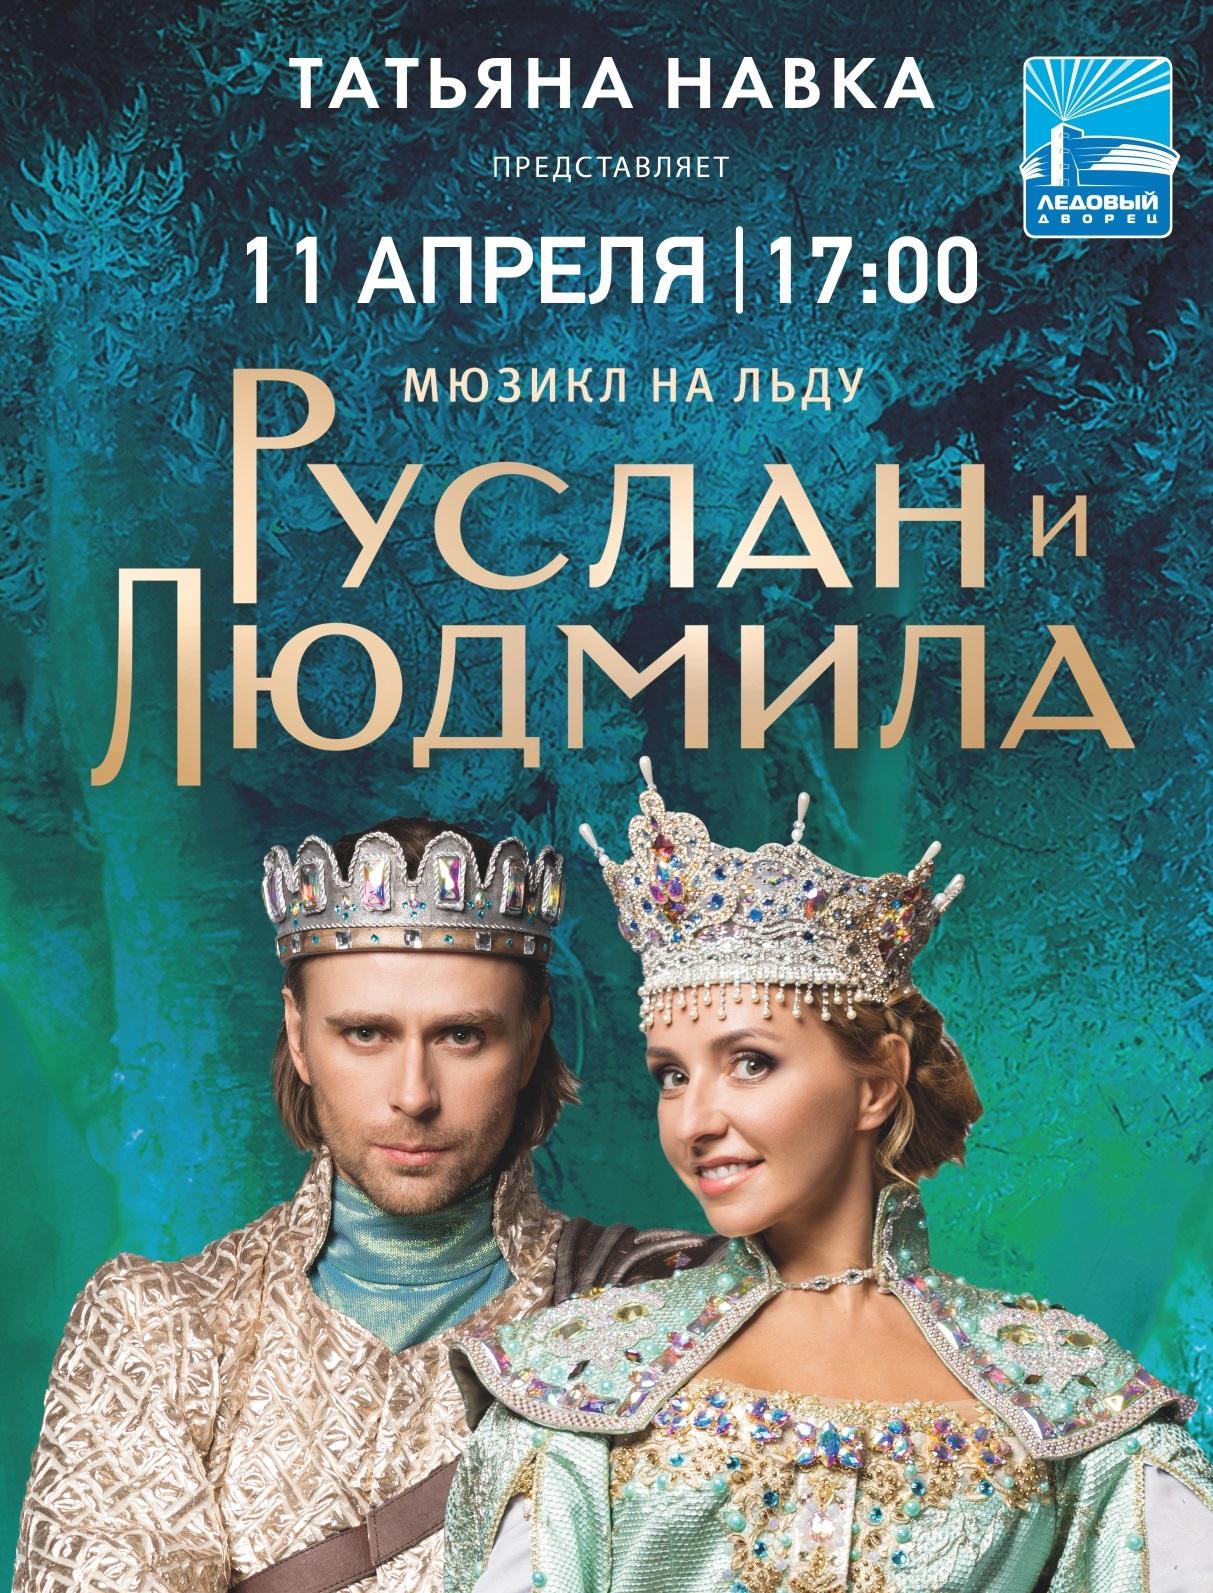 Ледовые шоу-6 - Страница 45 TObzbacYNT8